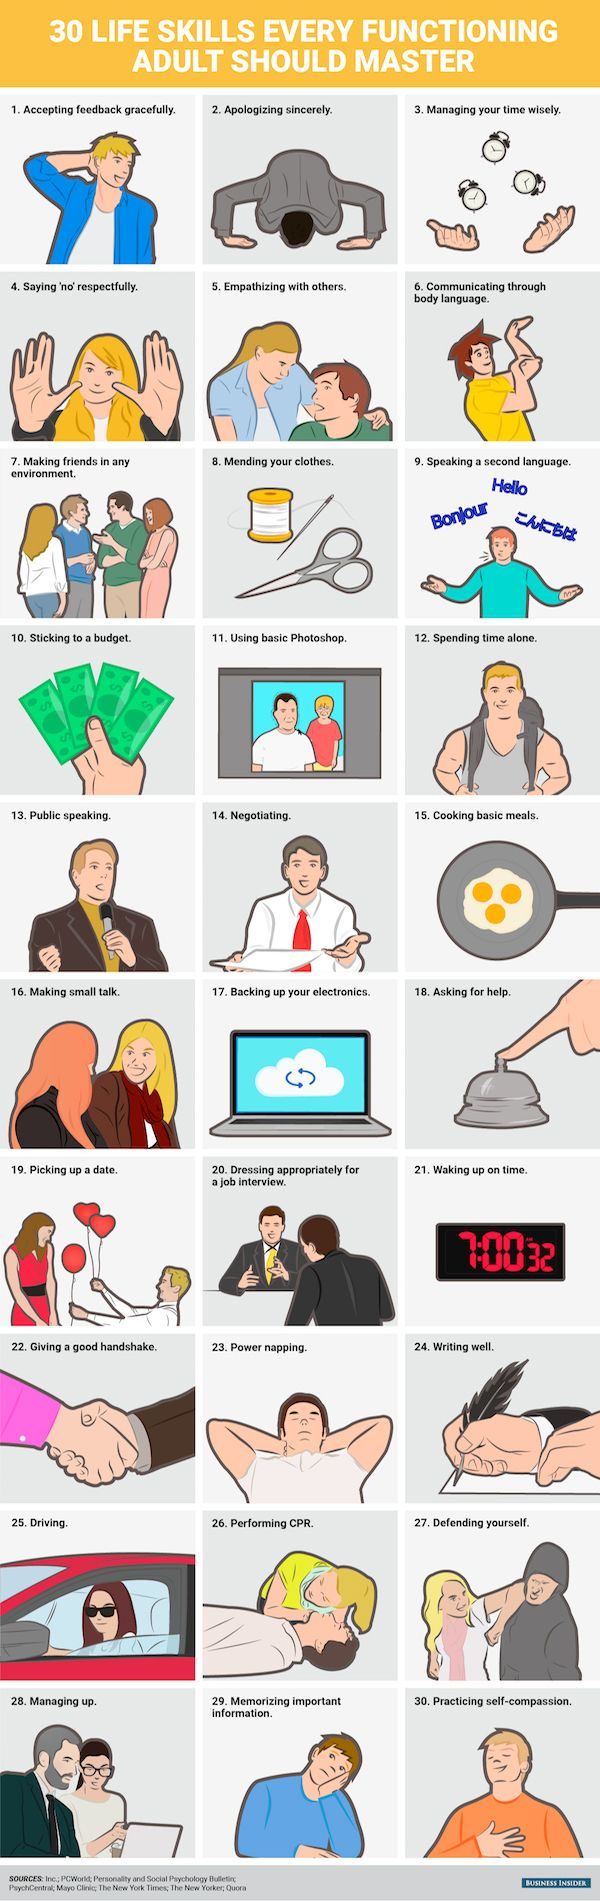 30 life skills every designer should master | Creative Bloq